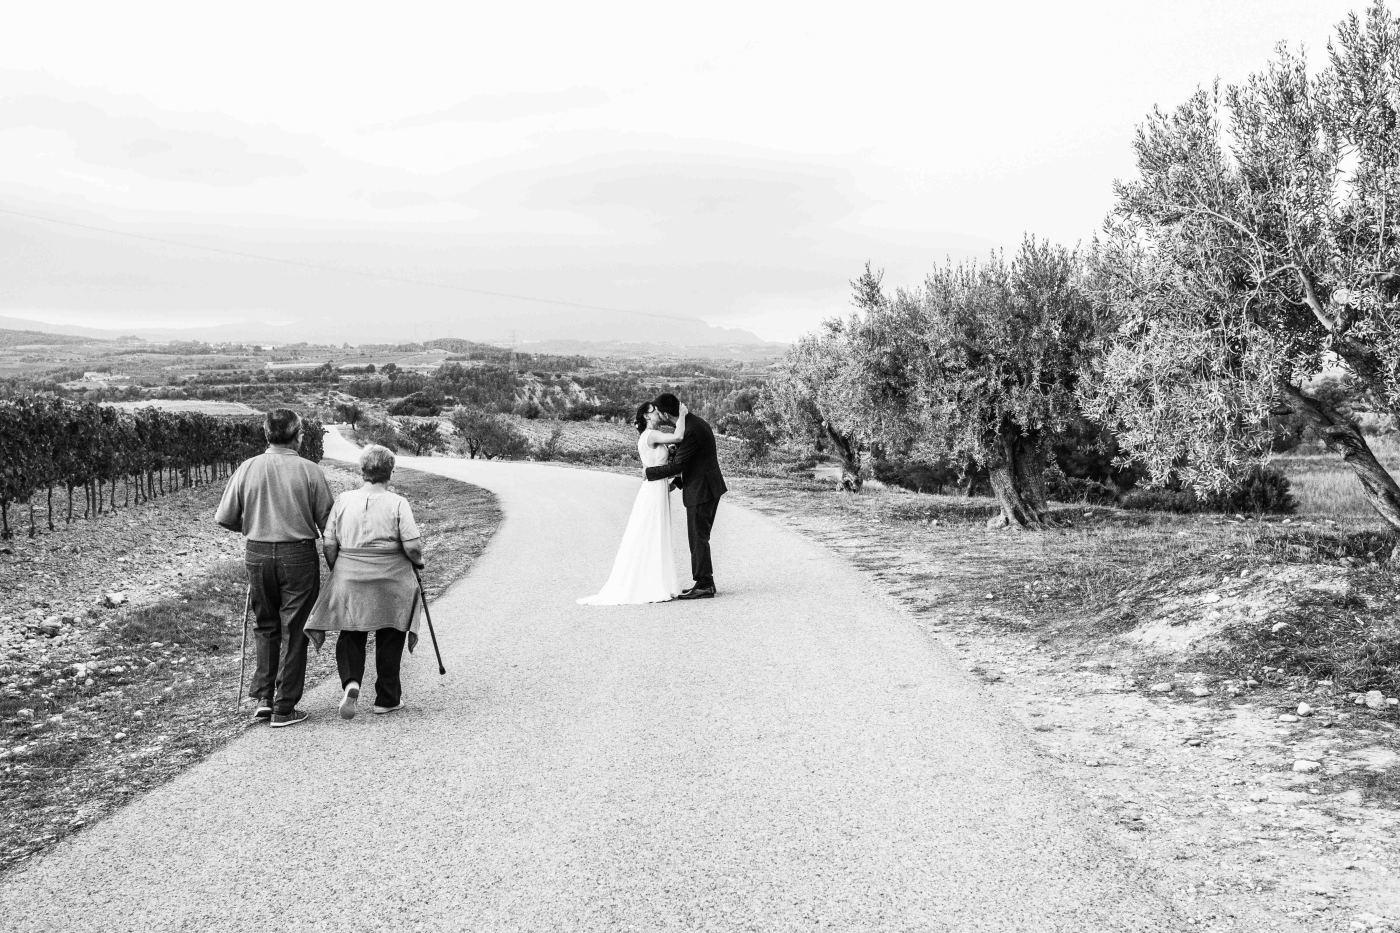 fotografo de boda Laura Arroyo